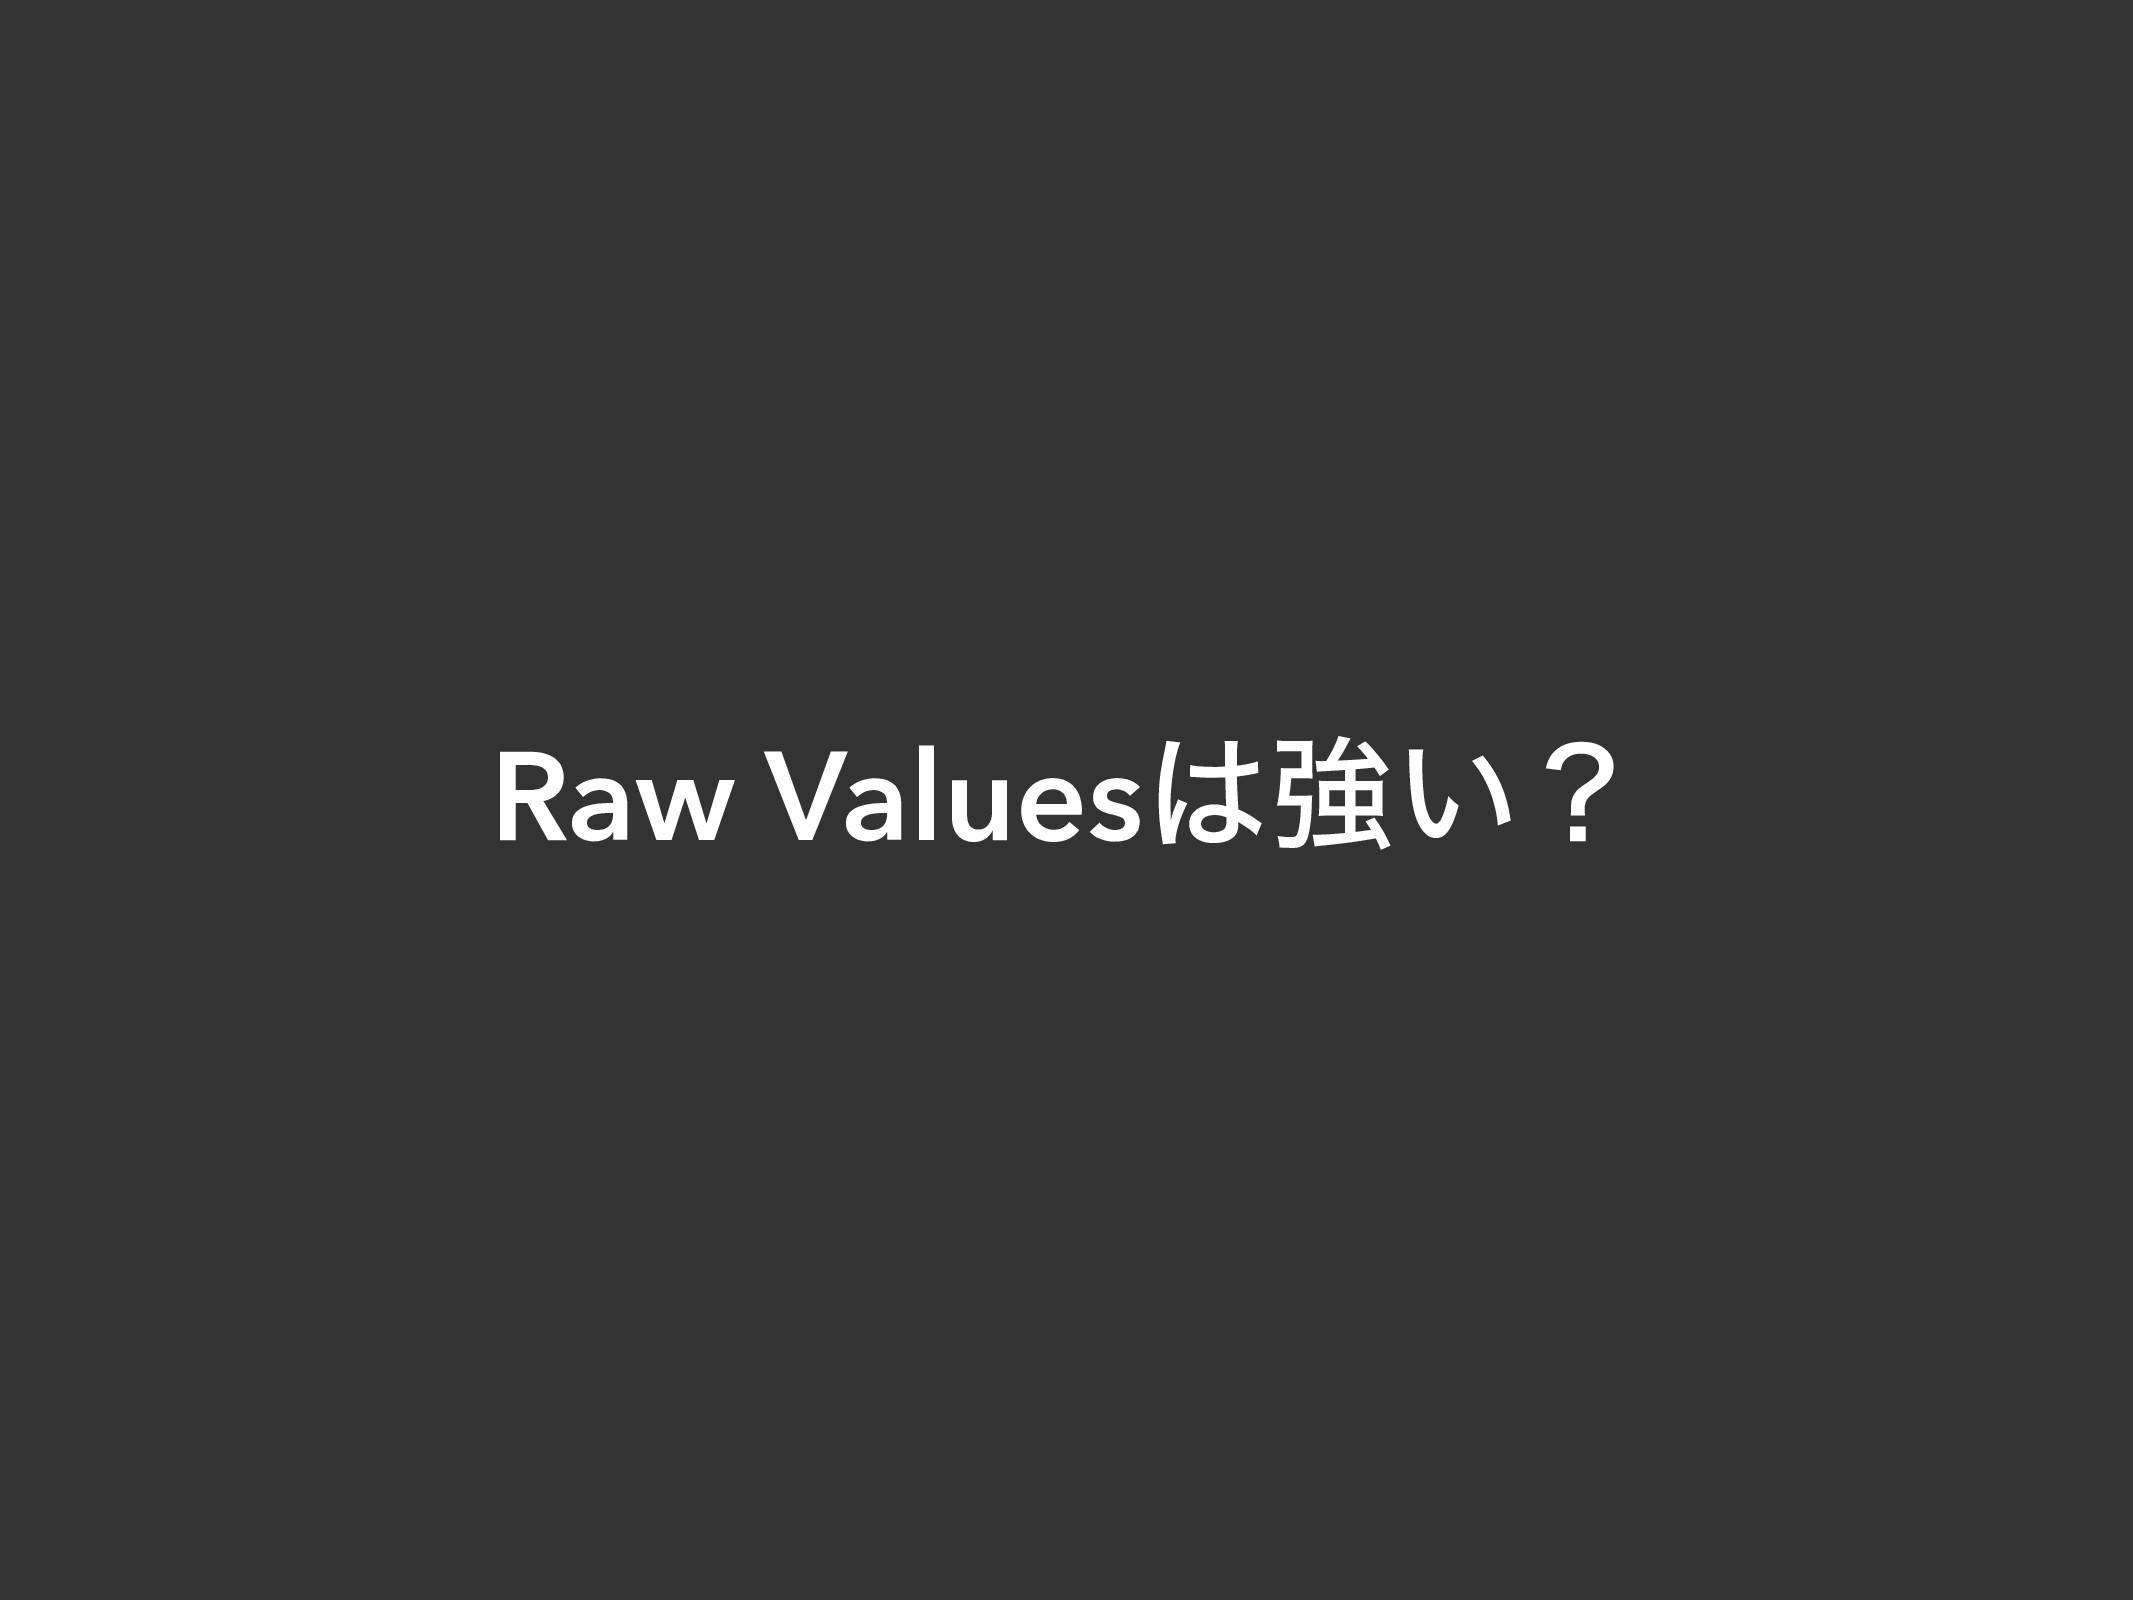 Raw Valuesڧ͍ʁ